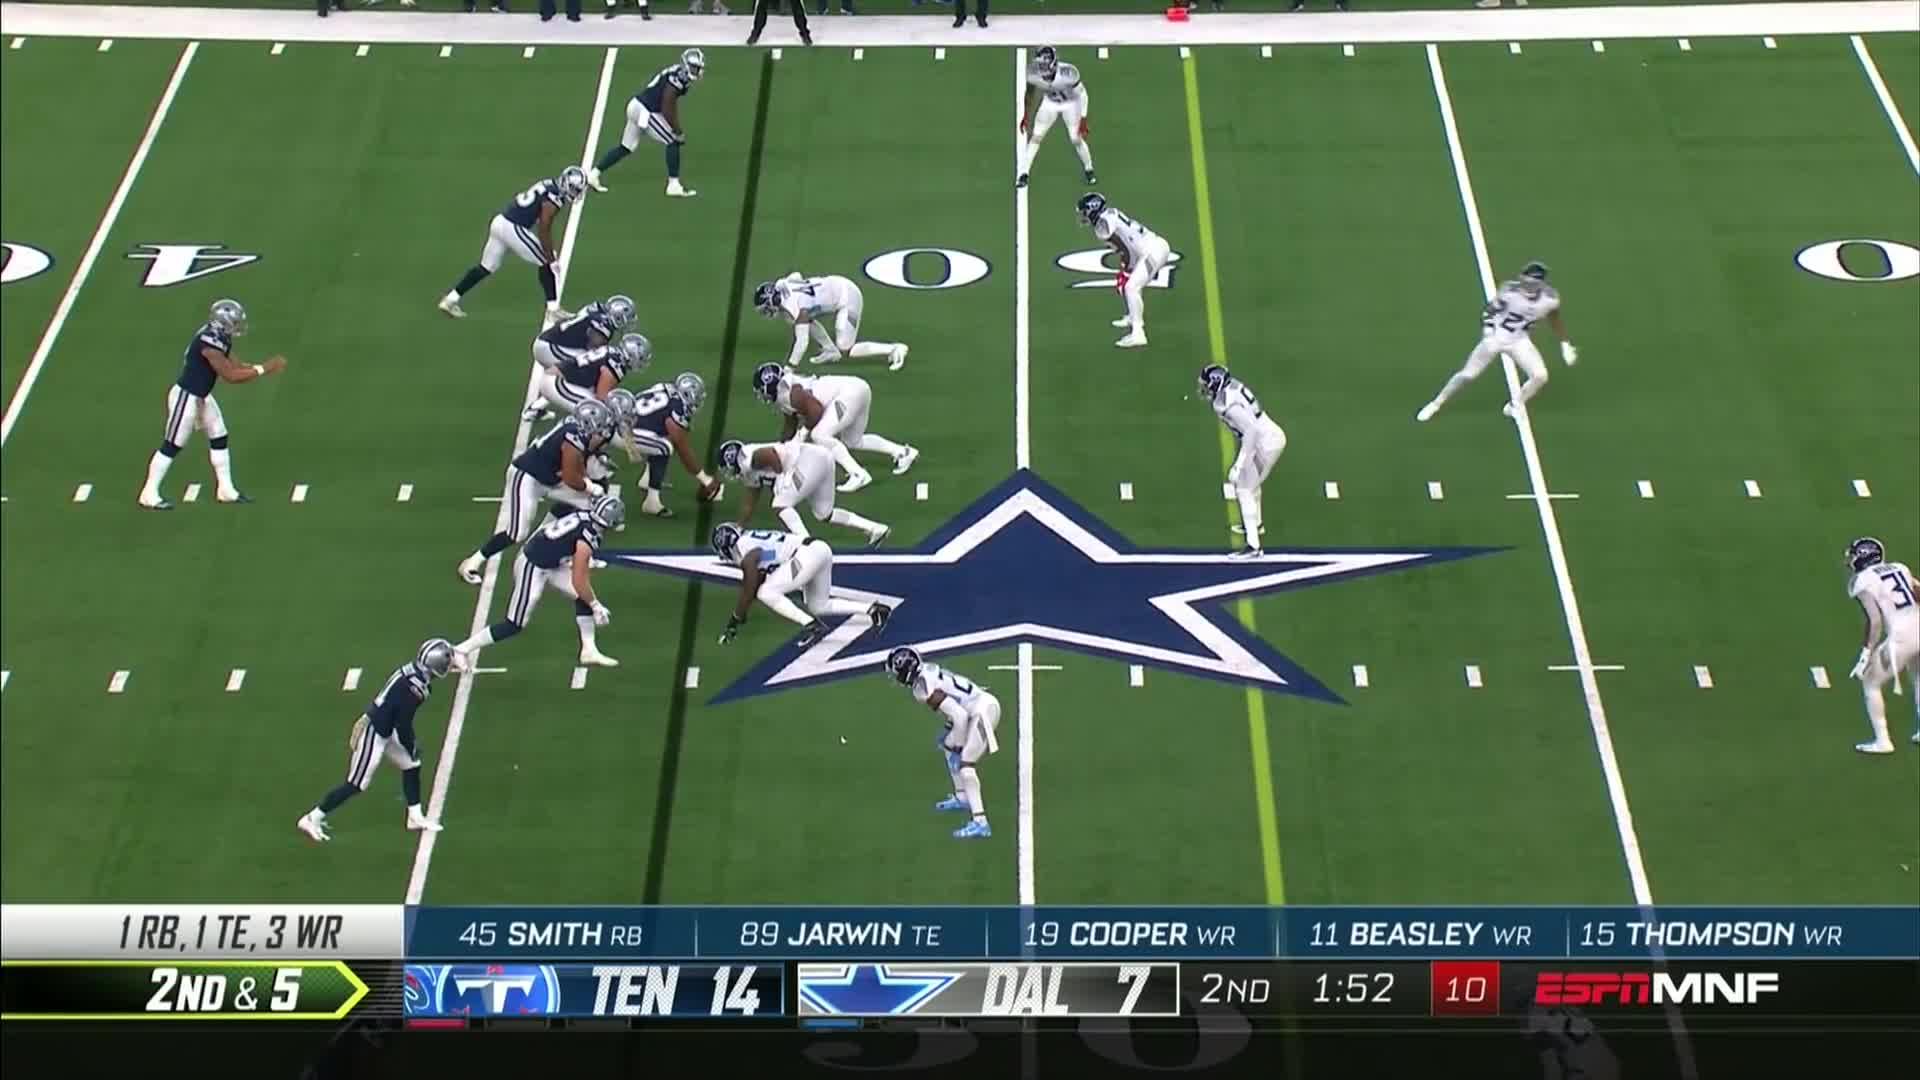 afc, american football, cowboys, dallas cowboy, defense, football, game, highlight, highlights, nfc, nfl, offense, tennessee titans, titans, Titans vs. Cowboys Week 9 Highlights | NFL 2018 GIFs